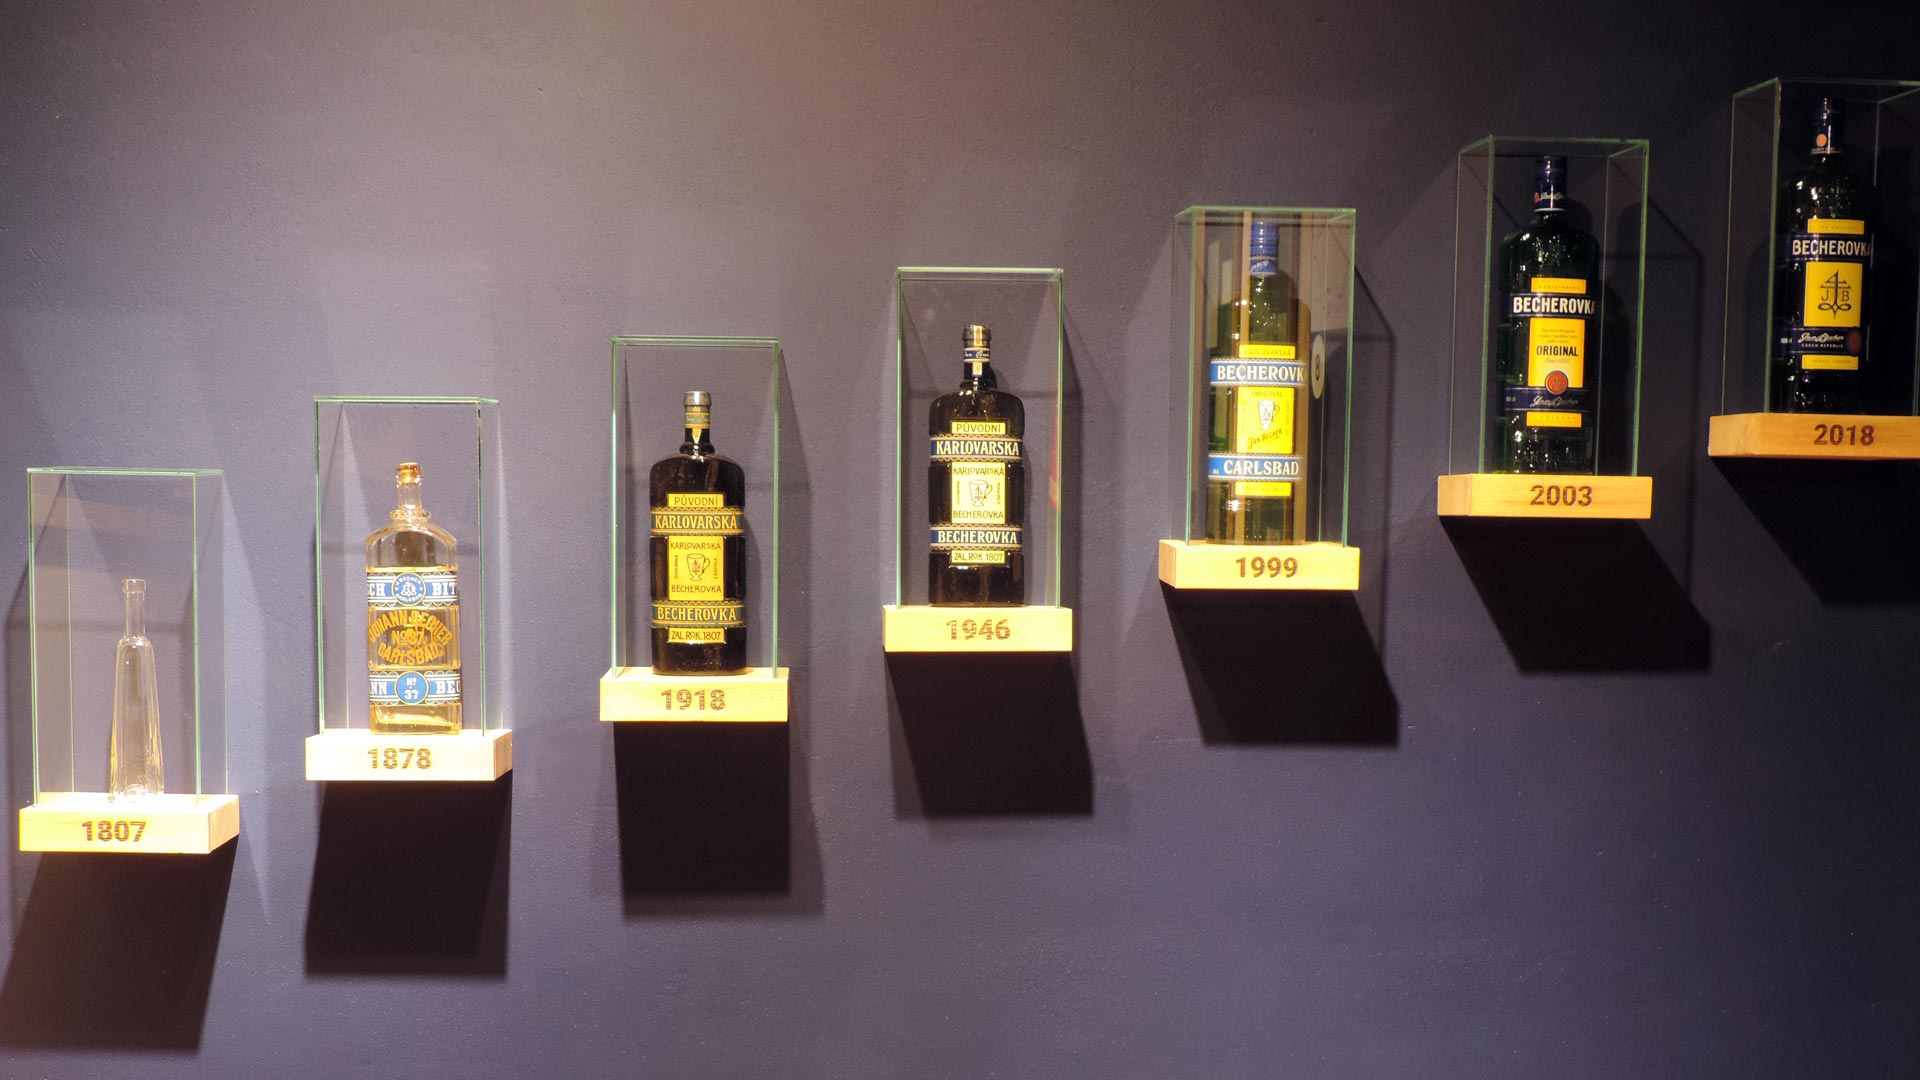 Botellas de becherovka